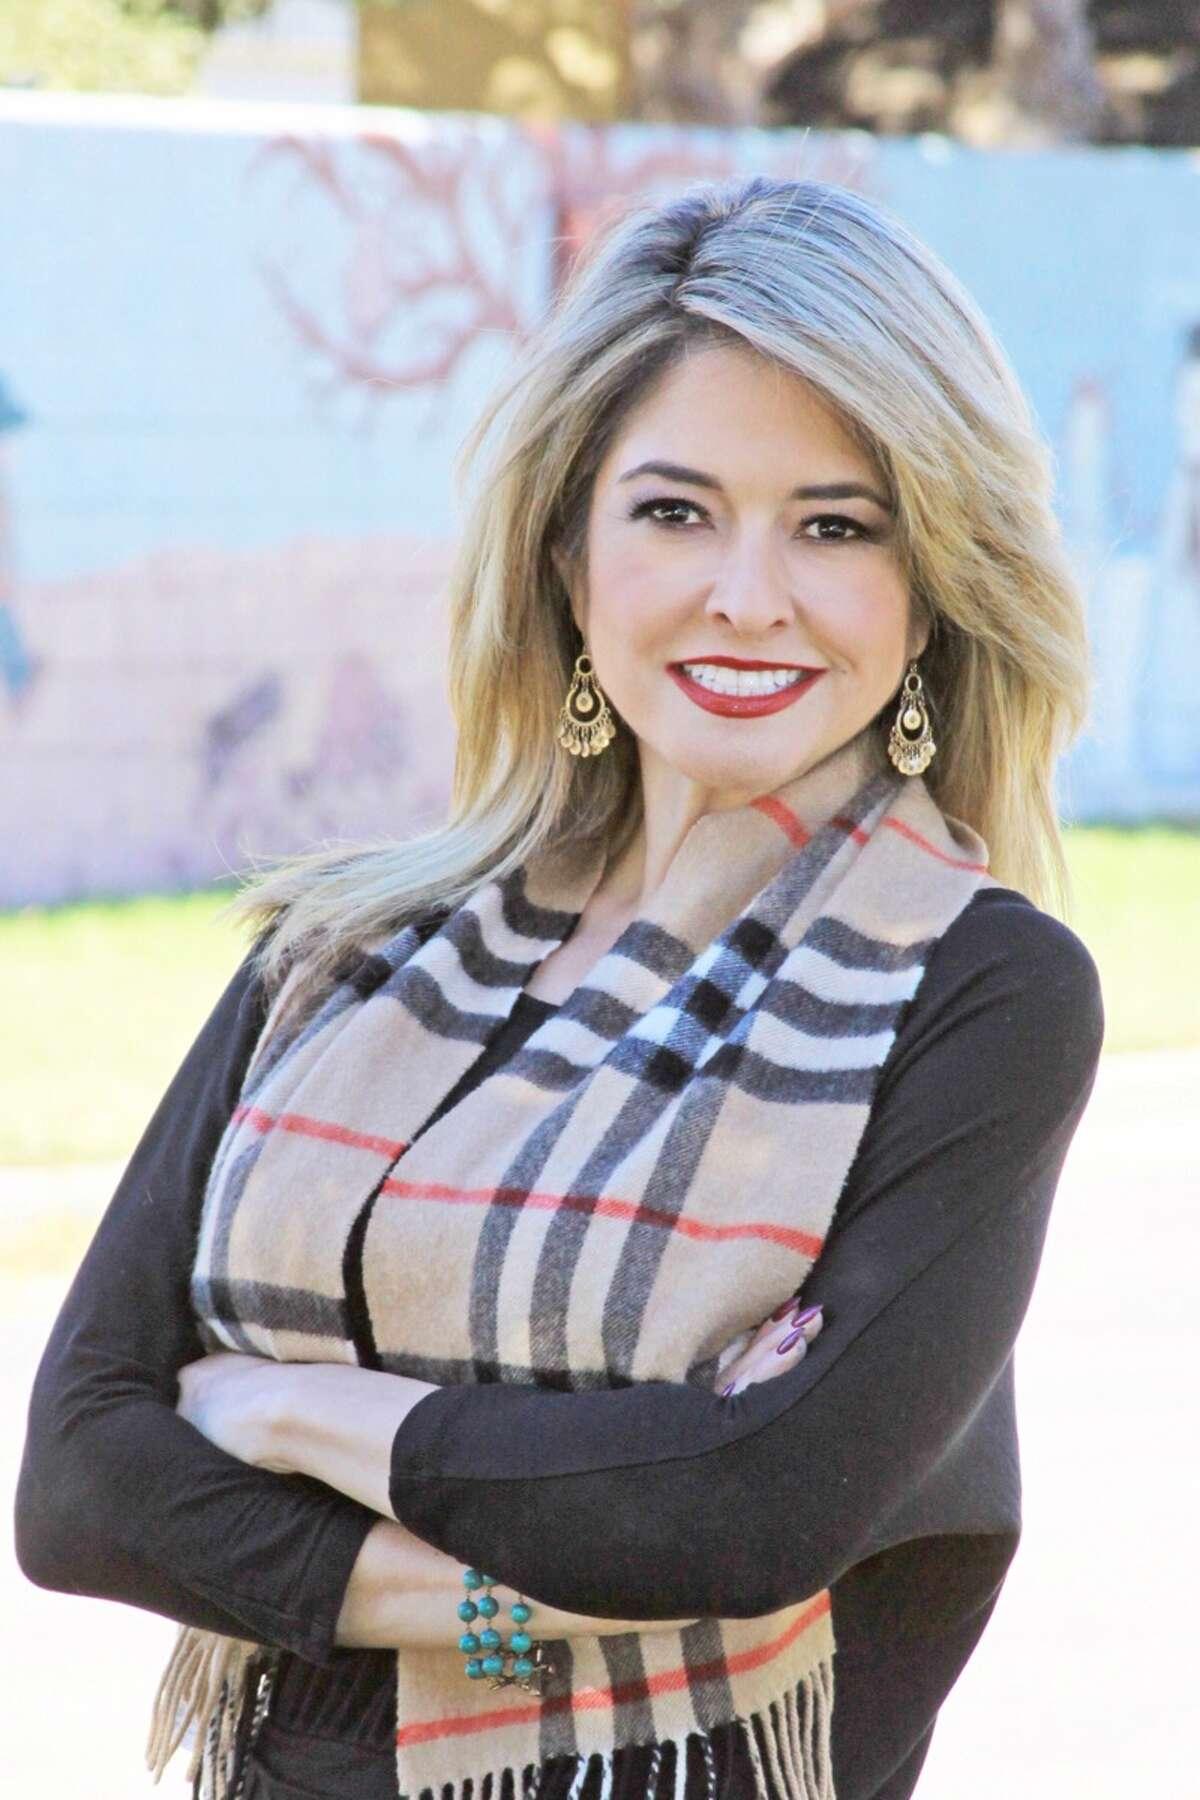 Melanie Saiz is the marketing and development director at Centers.